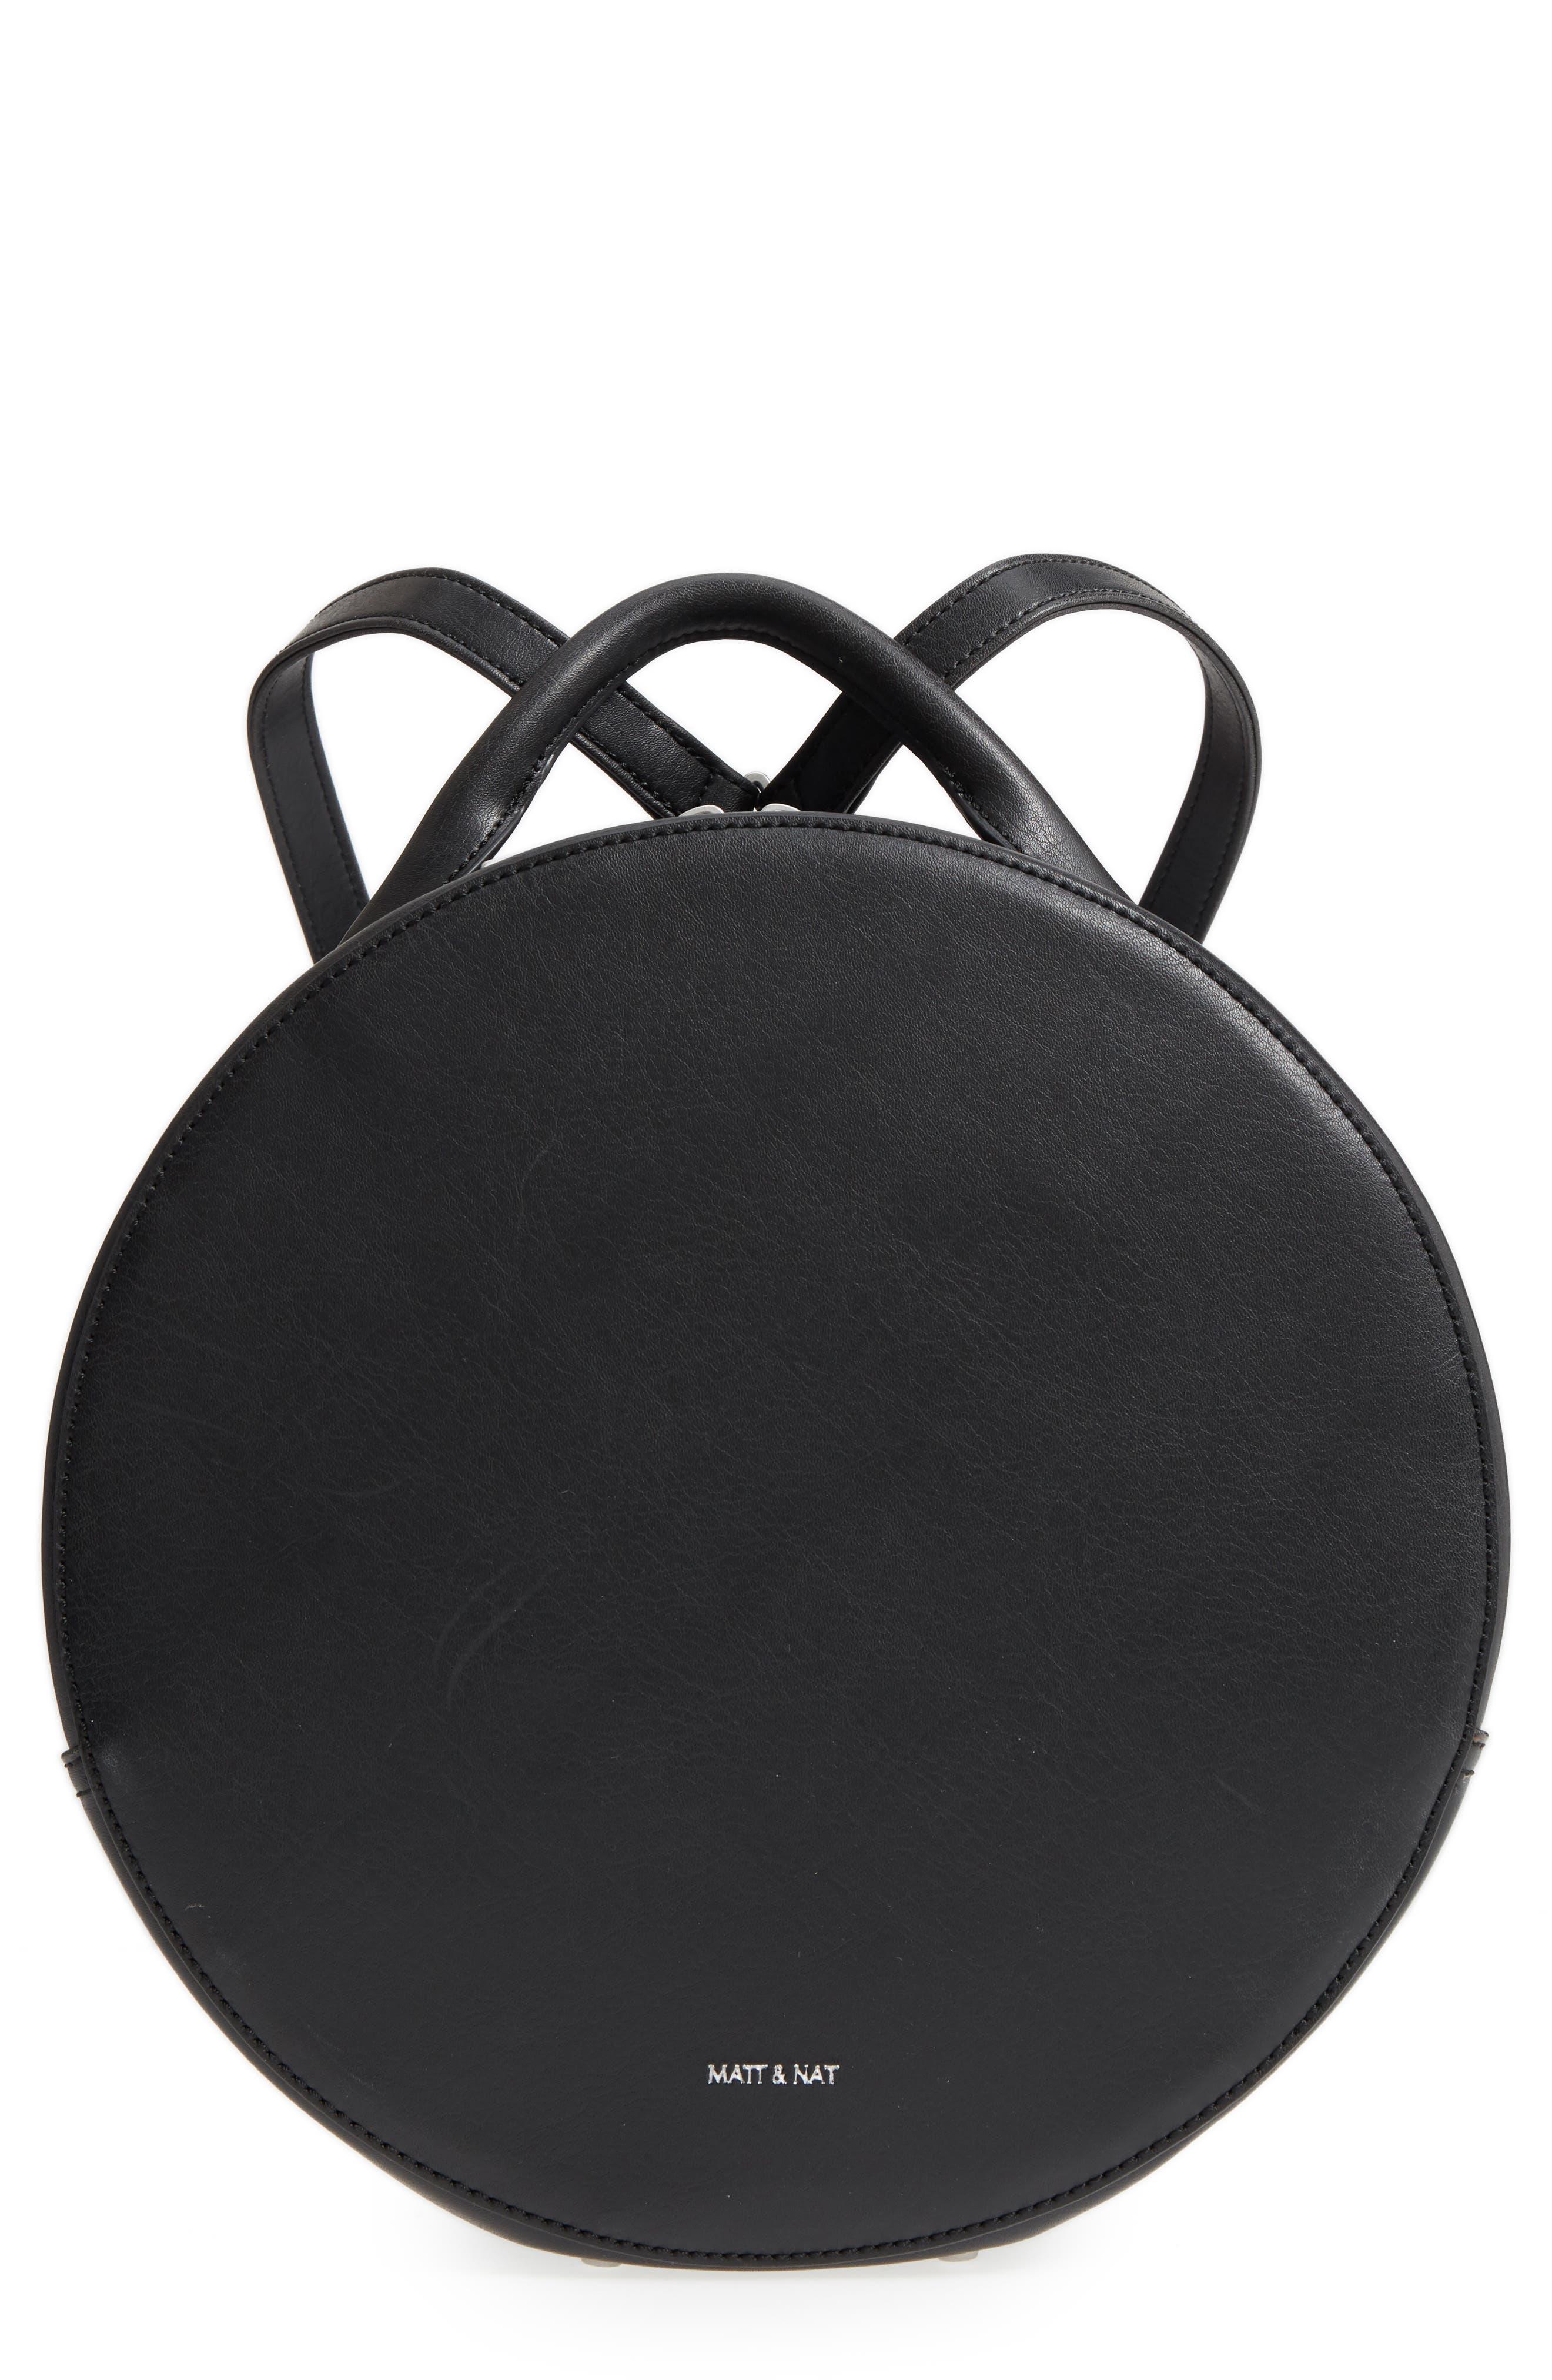 Matt & Nat Kiara Faux Leather Circle Backpack - Black